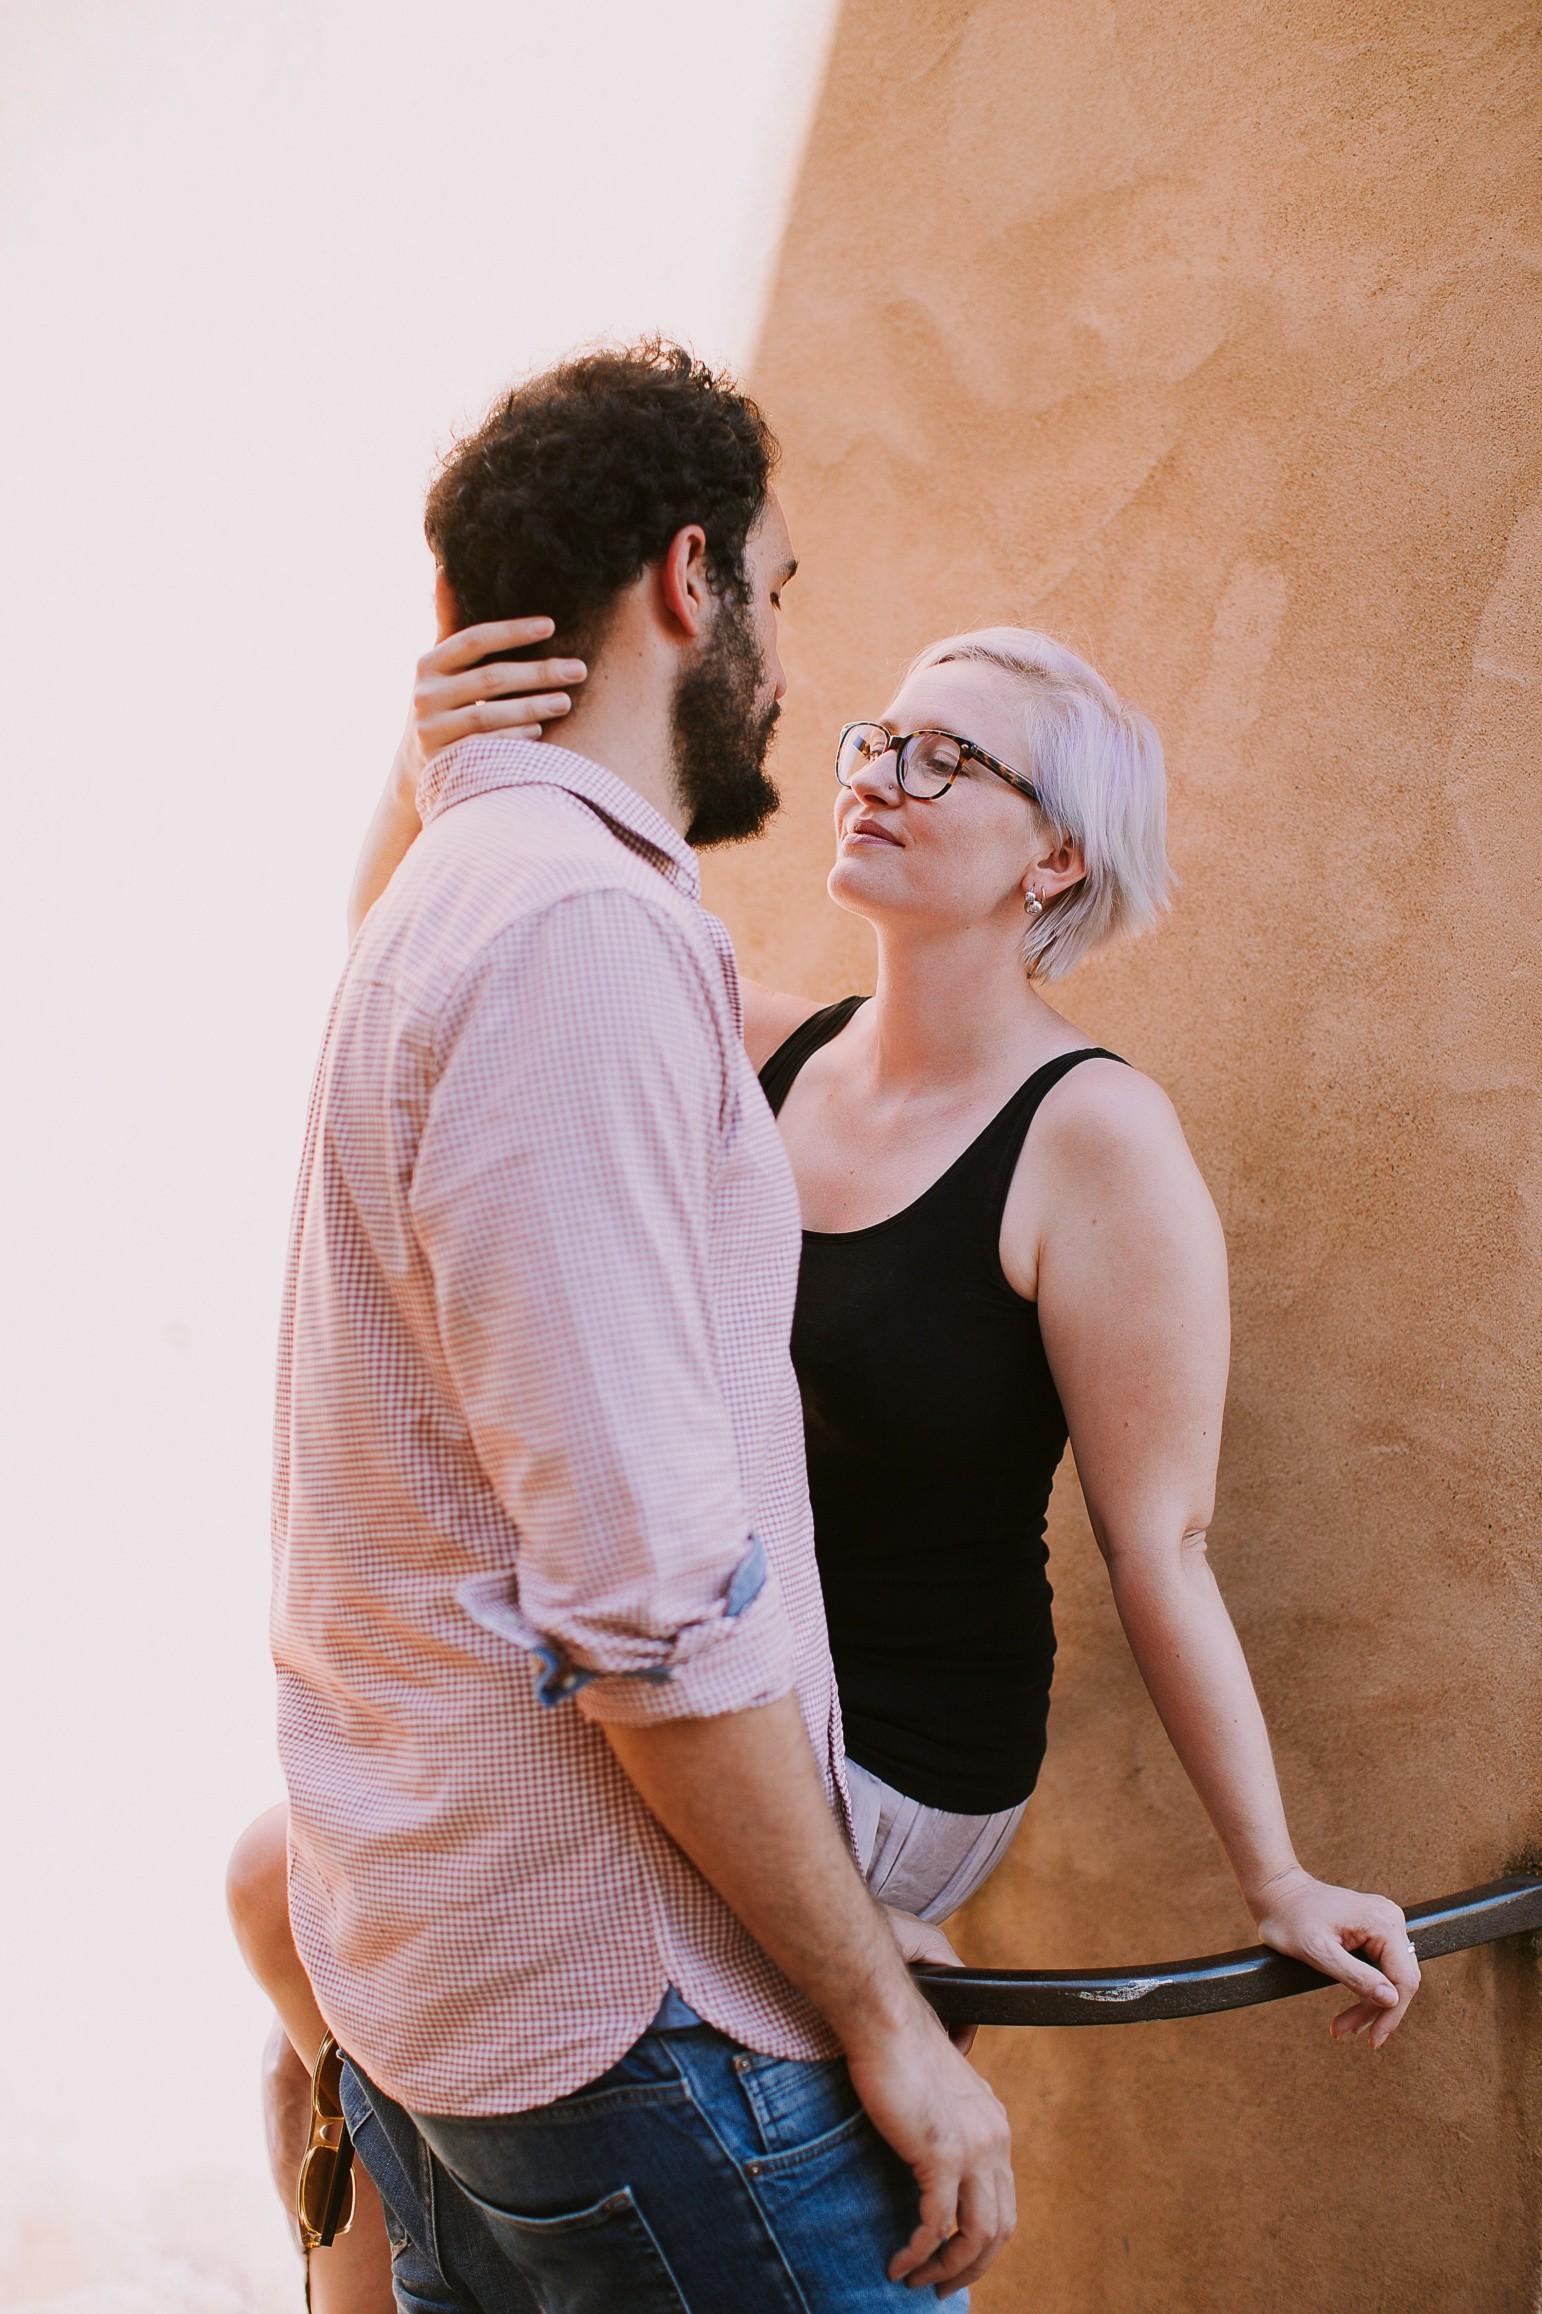 kateryna-photos-mariage-photographe-pornic-bretagne-nantes-couple-engagement-love-story-le-mans-wedding_0198.jpg